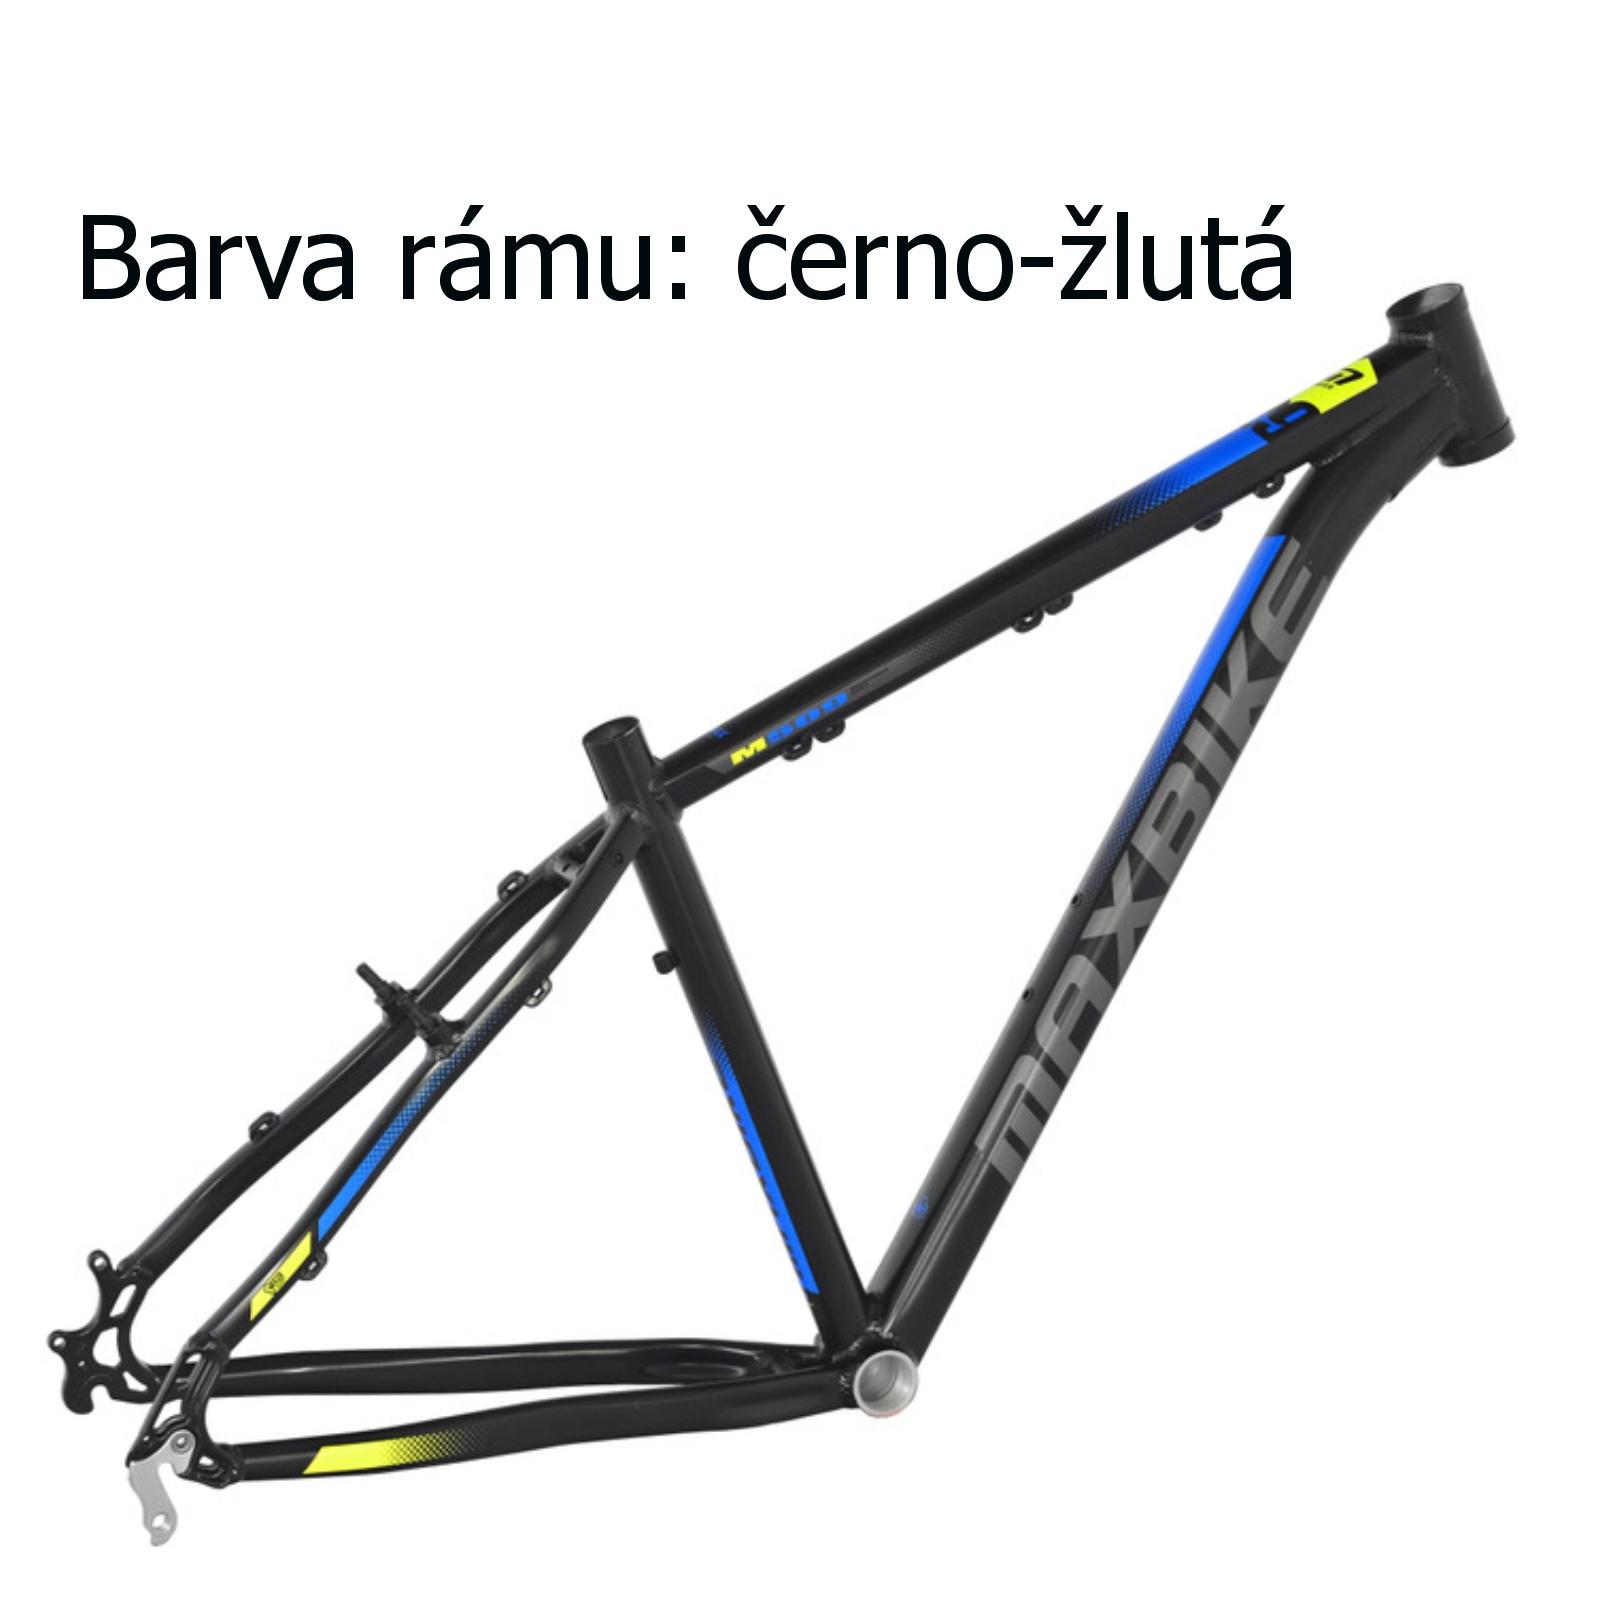 "Horské kolo MAXBIKE Apo 29 černo-žluté - vel. rámu 15"""